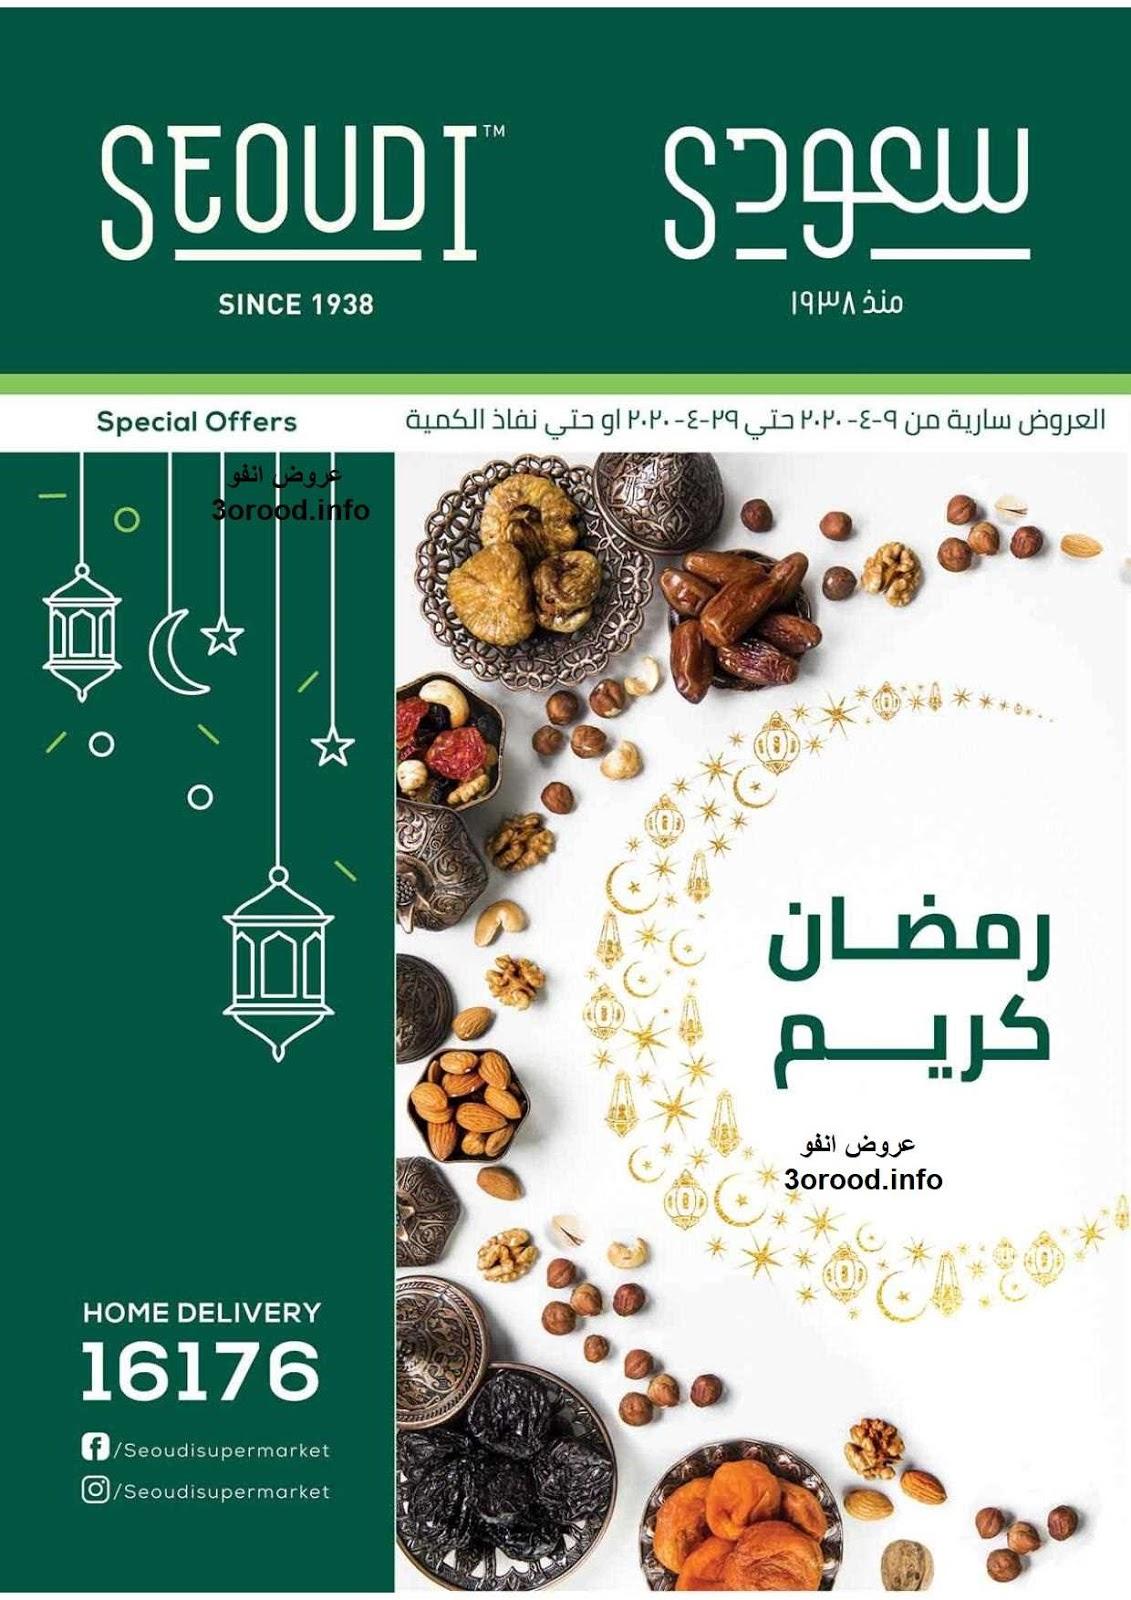 عروض سعودى ماركت رمضان من 9 ابريل حتى 29 ابريل 2020